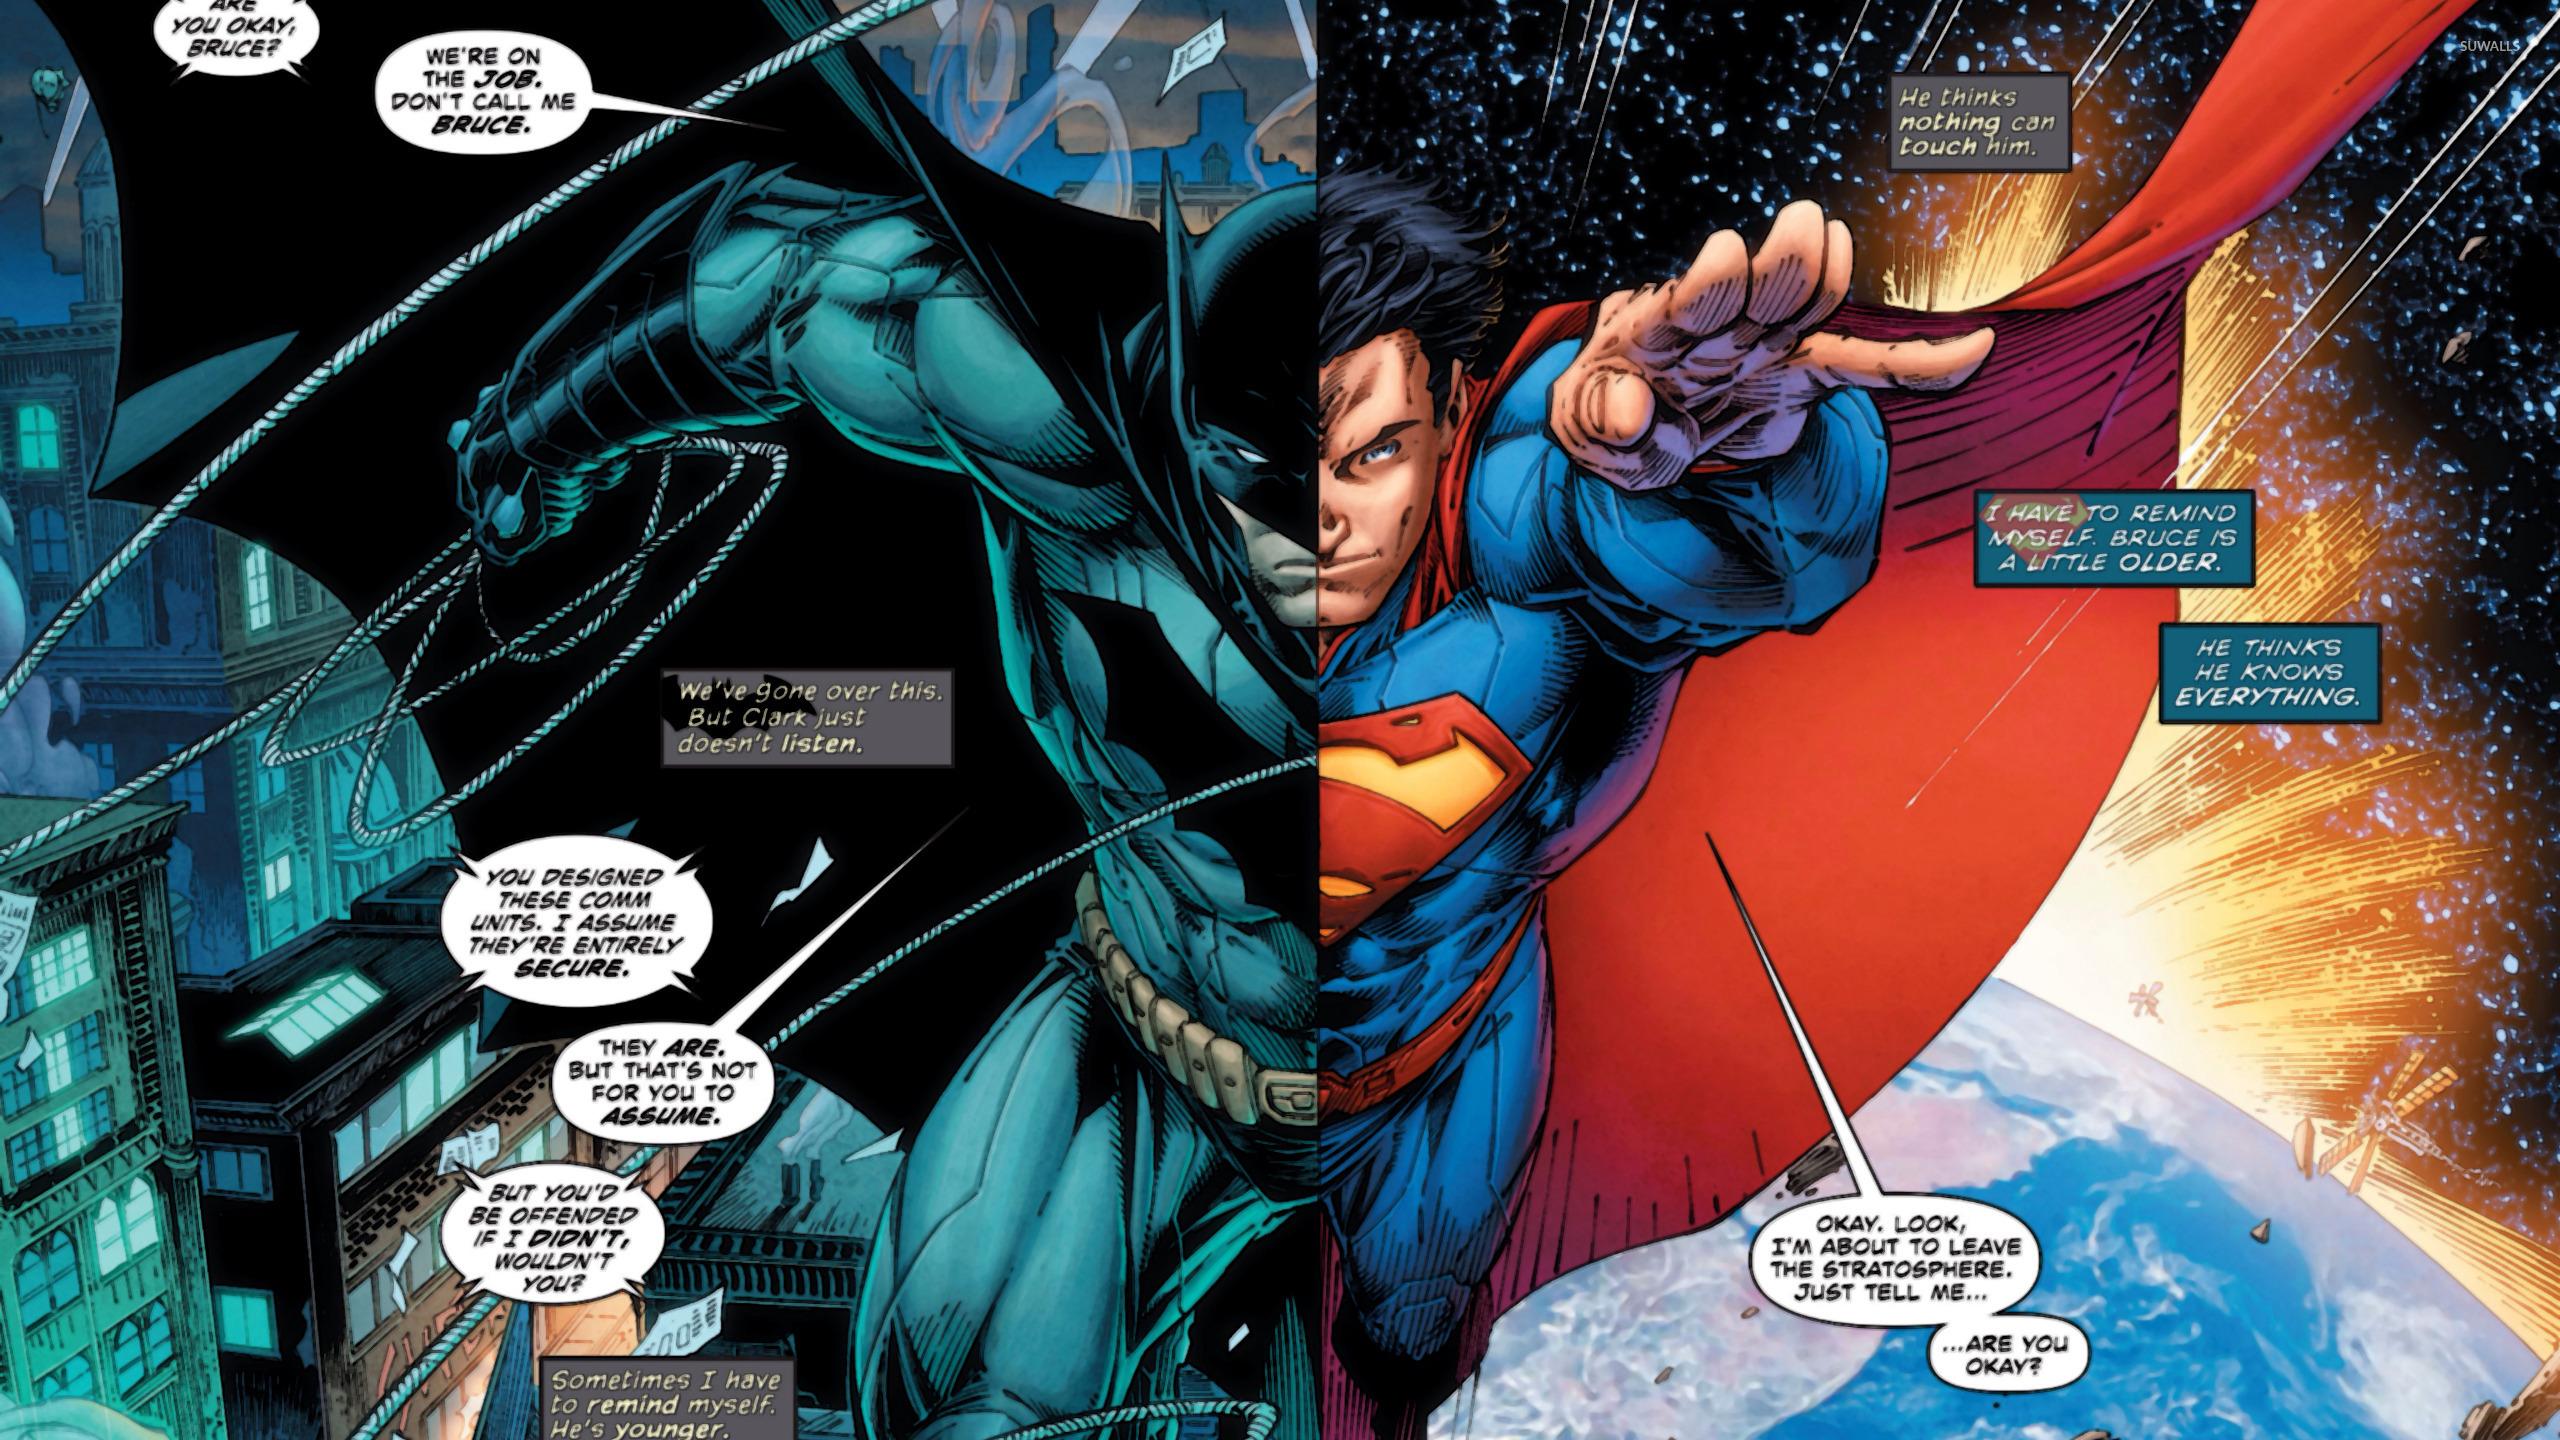 batman and superman cartoon wallpaper - photo #31